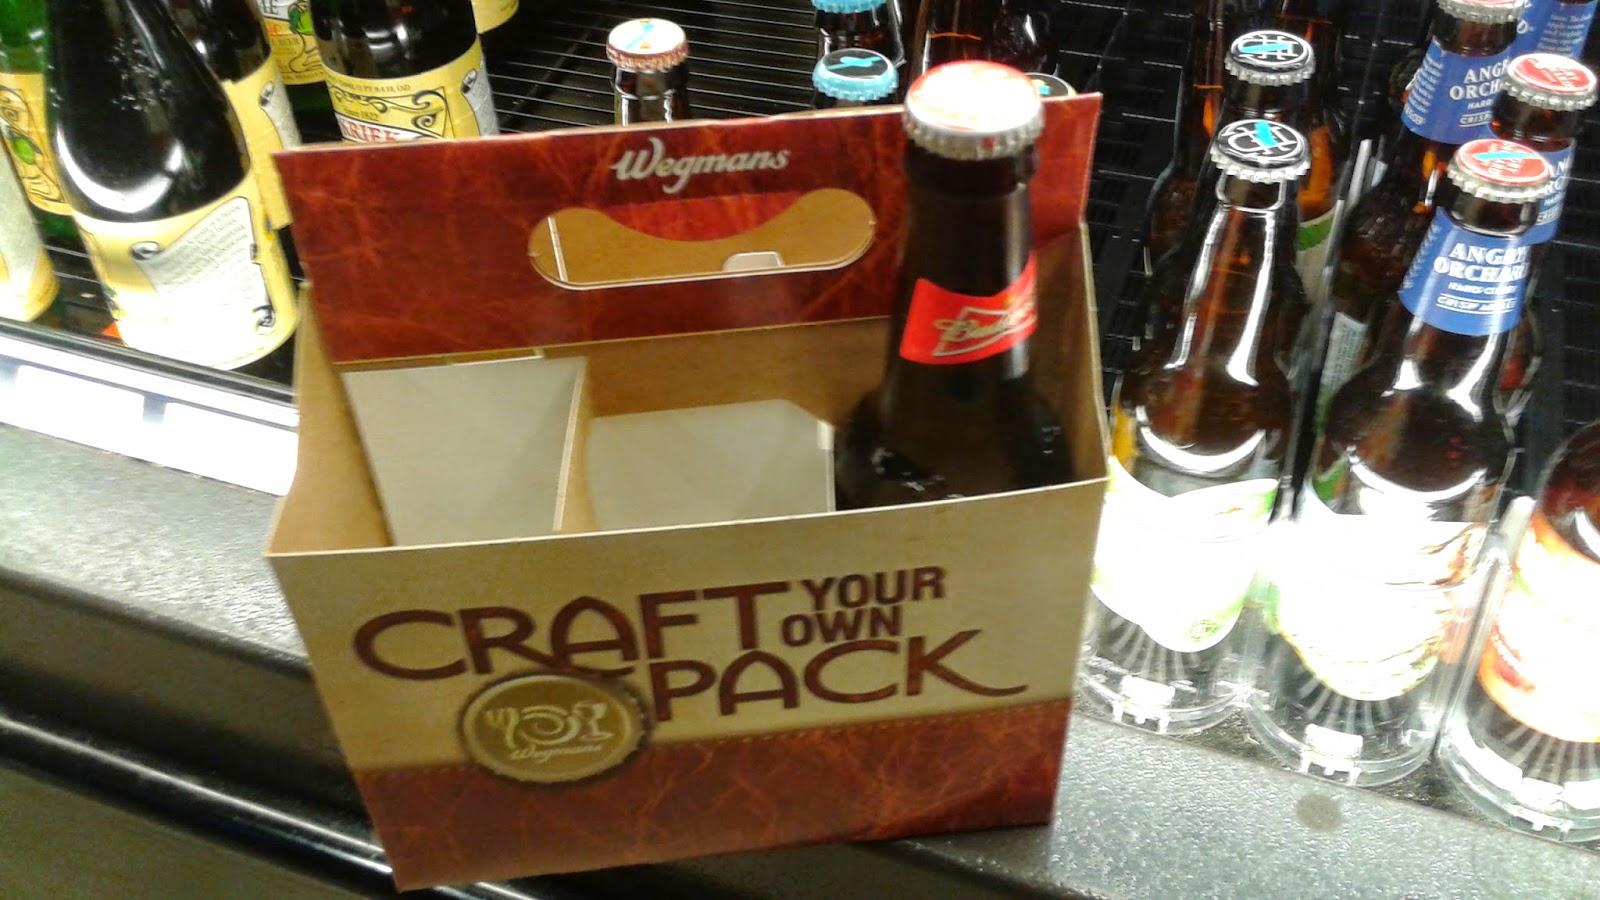 Wegmans Craft Your Own Pack Beer